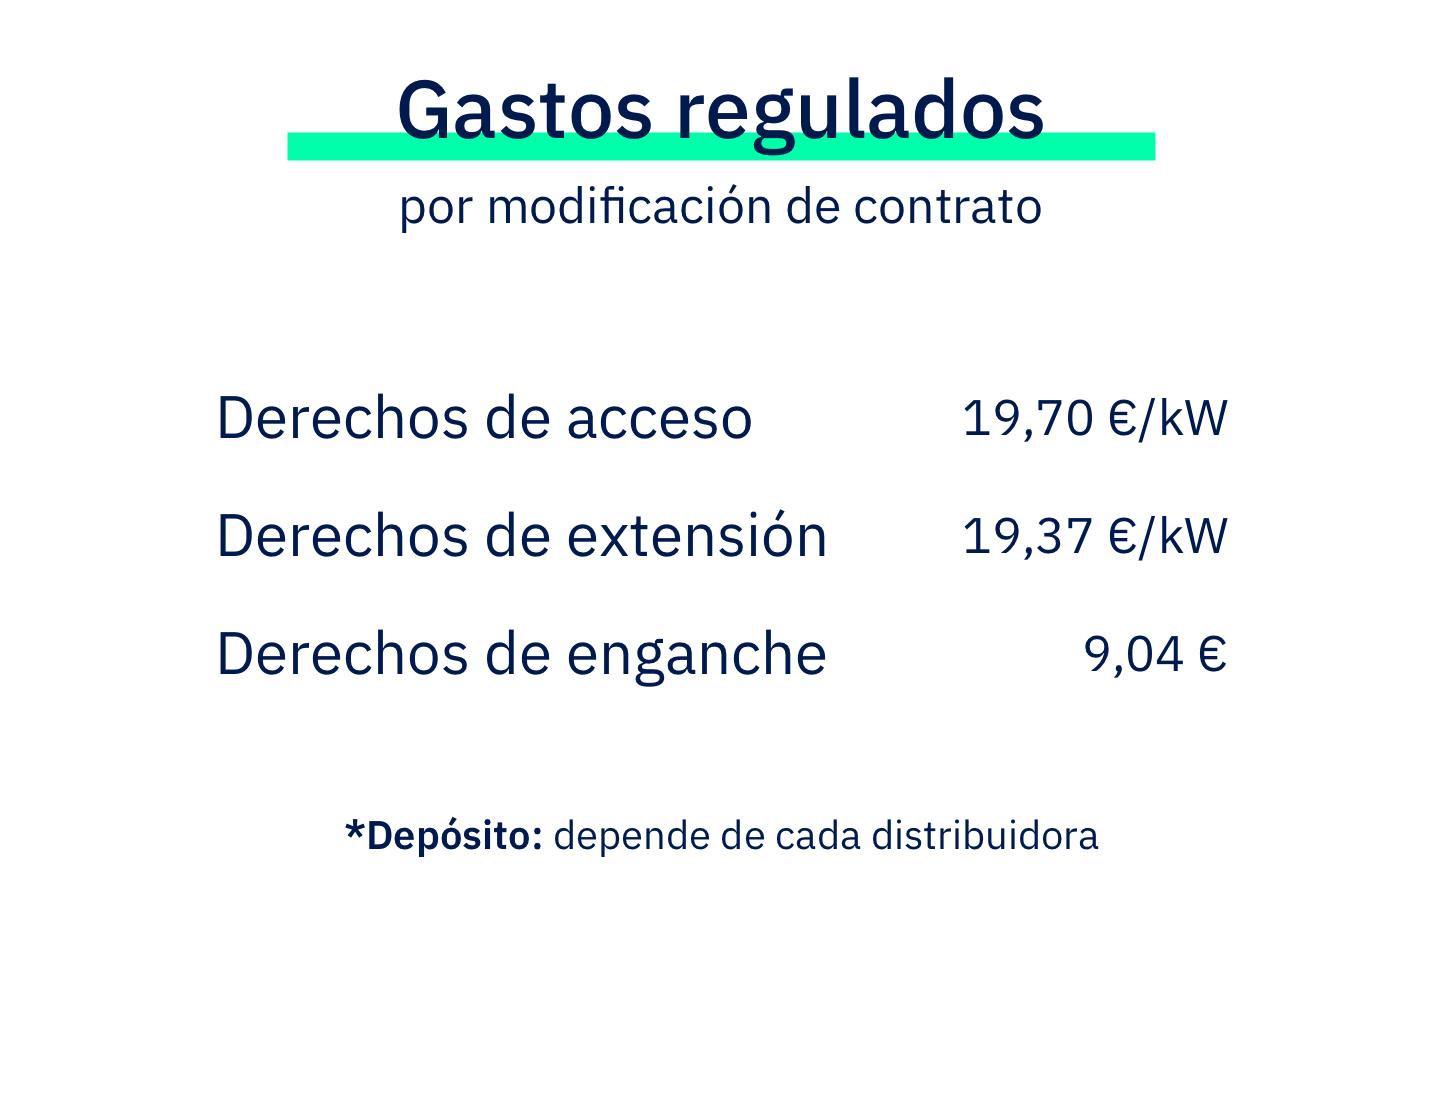 lucera-gastos-regulados-potencia